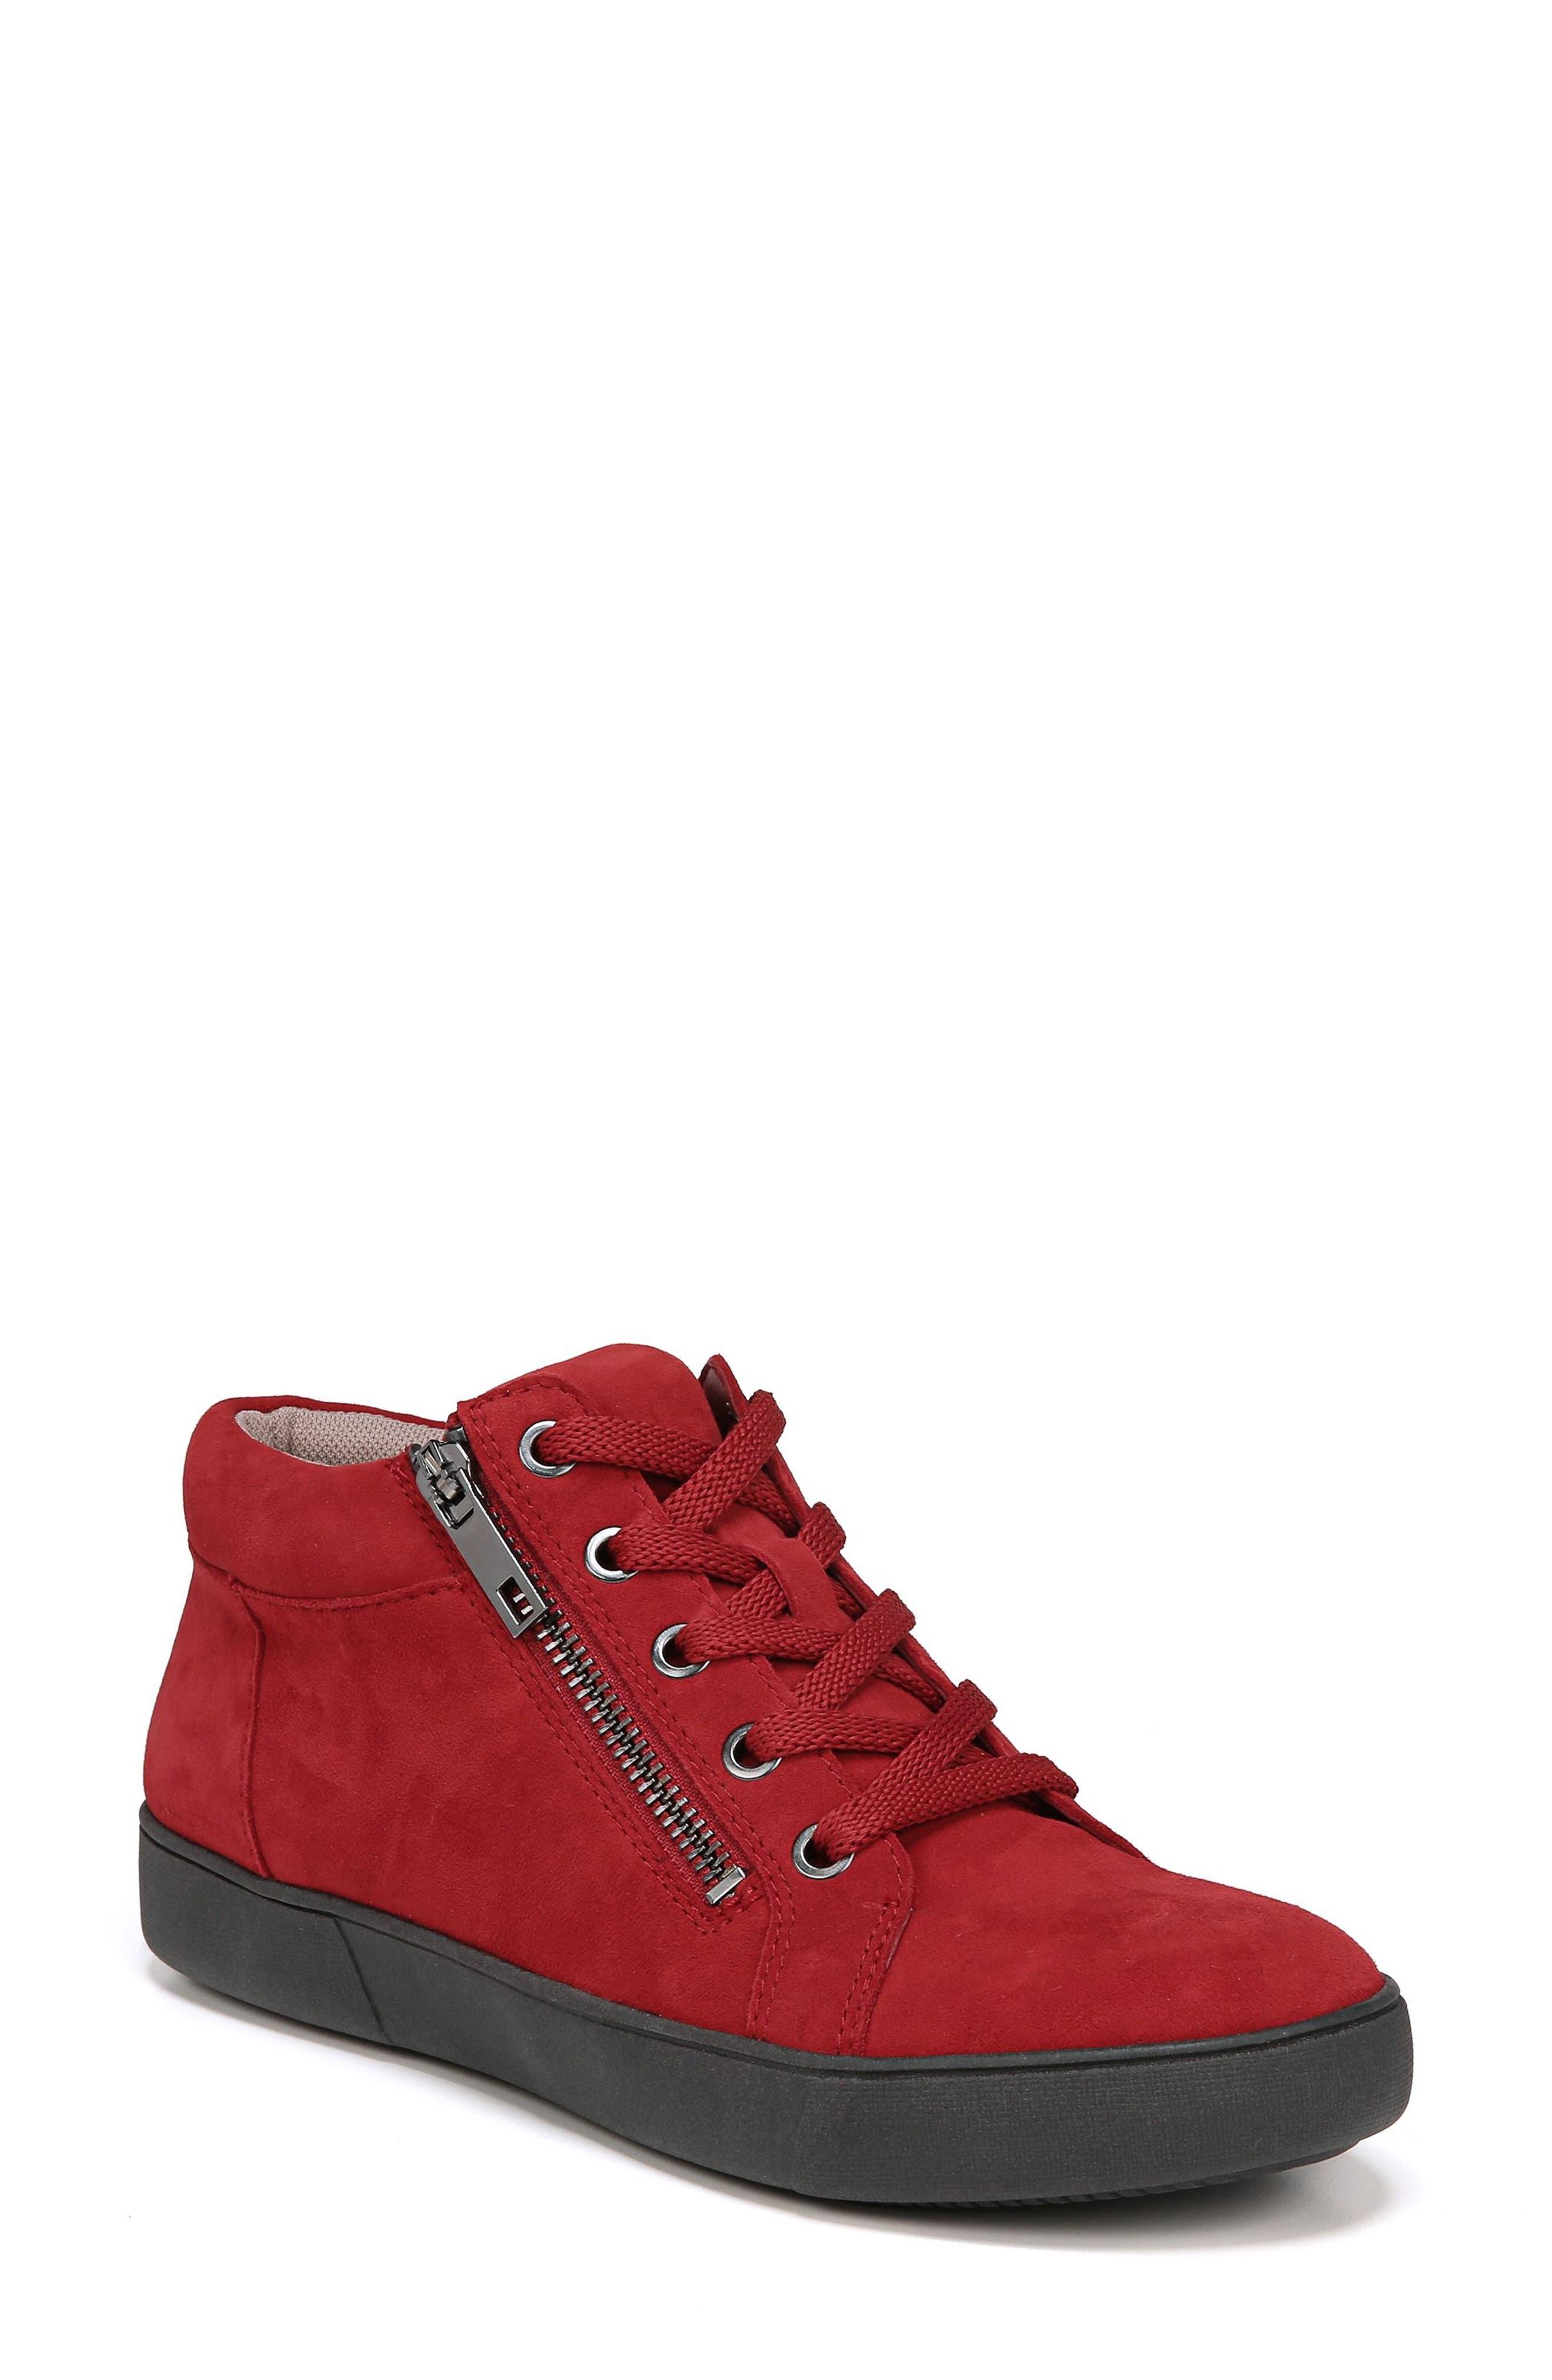 Motley Sneaker,                         Main,                         color, Hot Sauce Suede